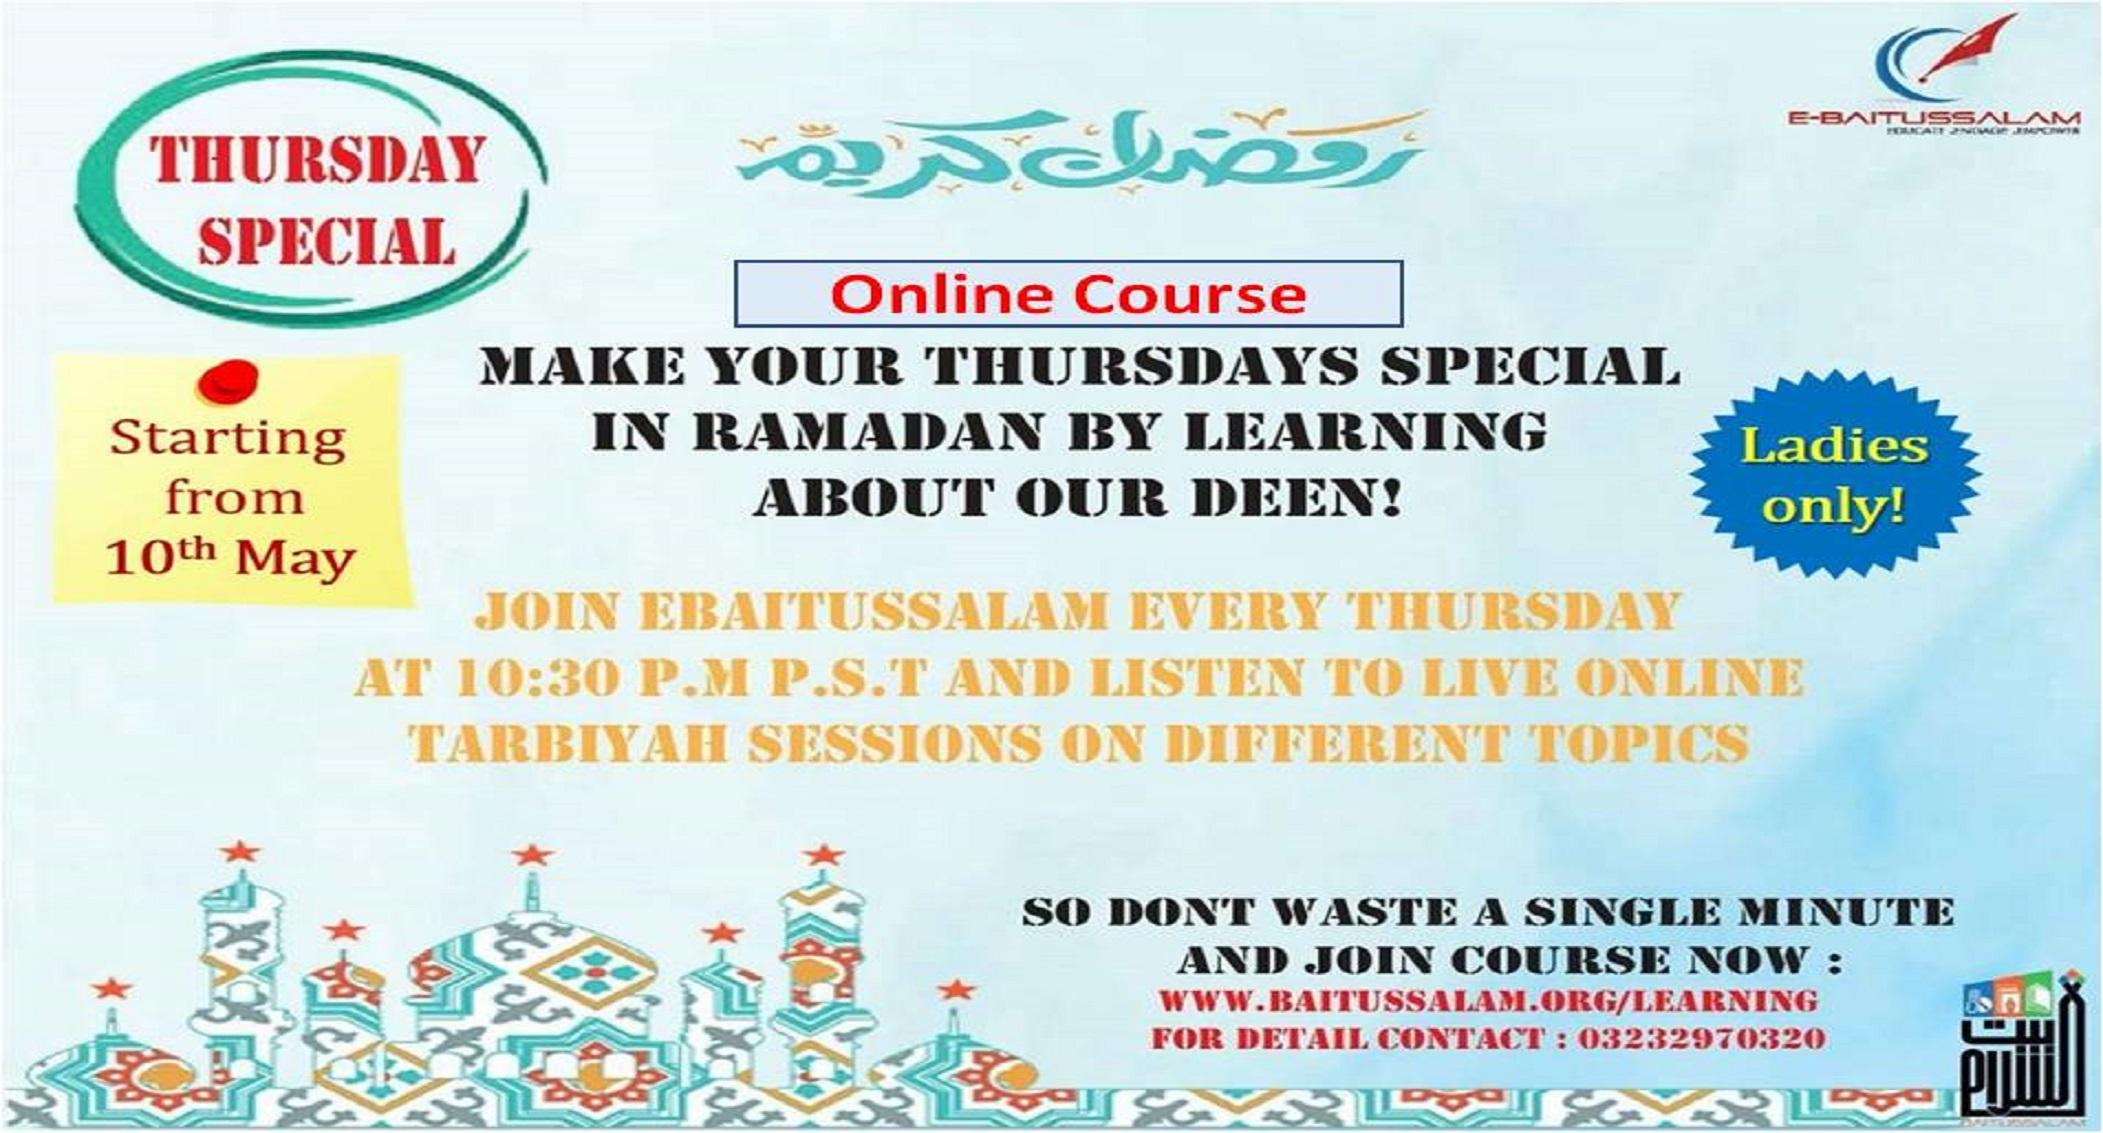 Thursday Special